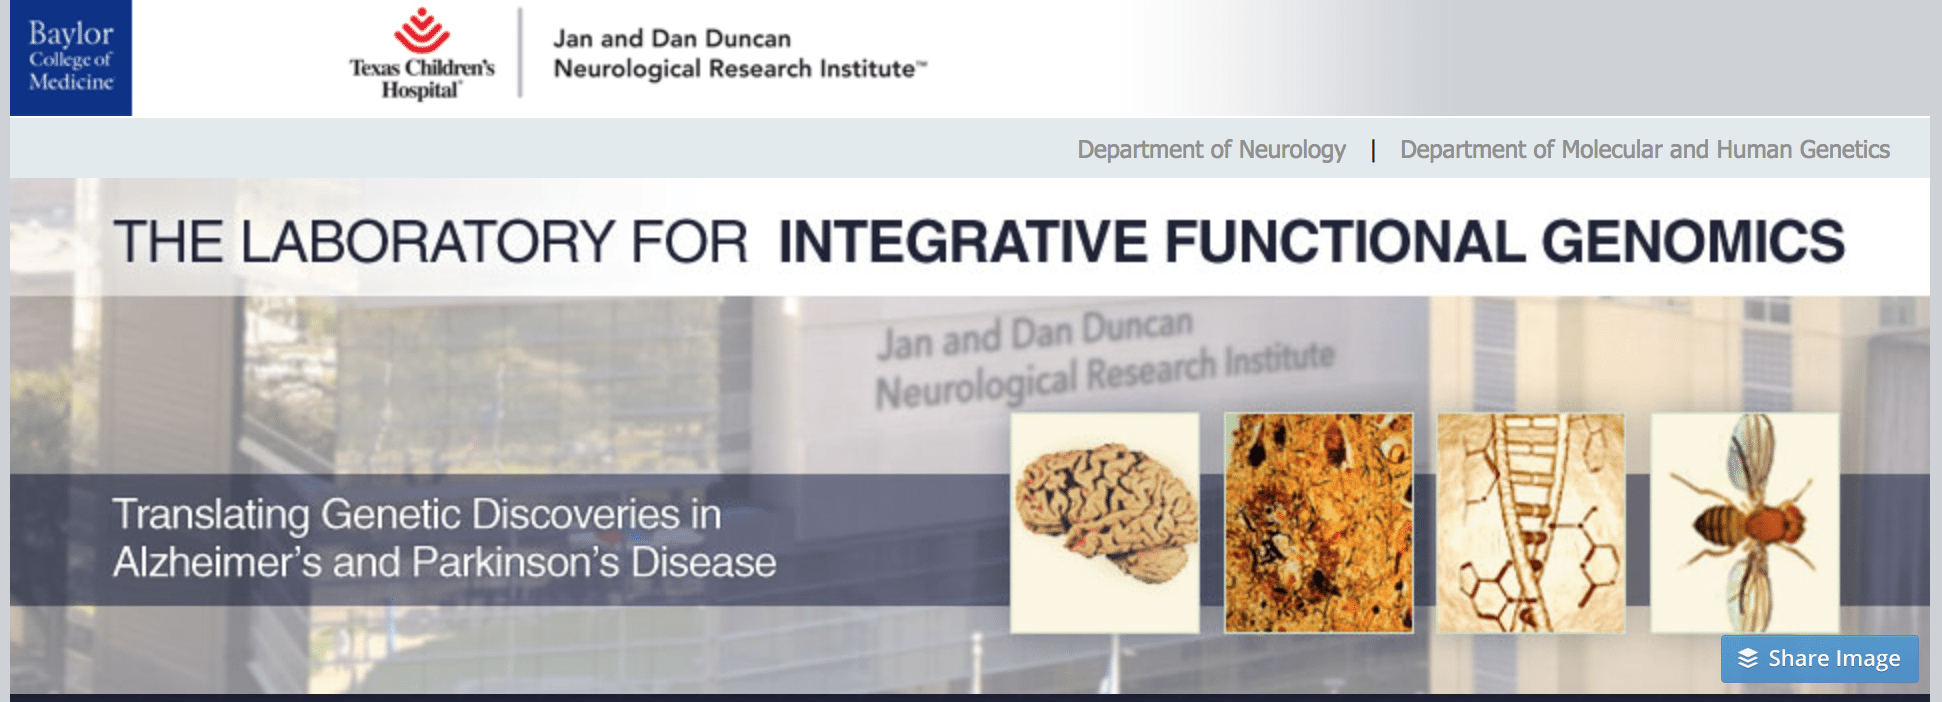 Laboratory for Integrative Functional Genomics